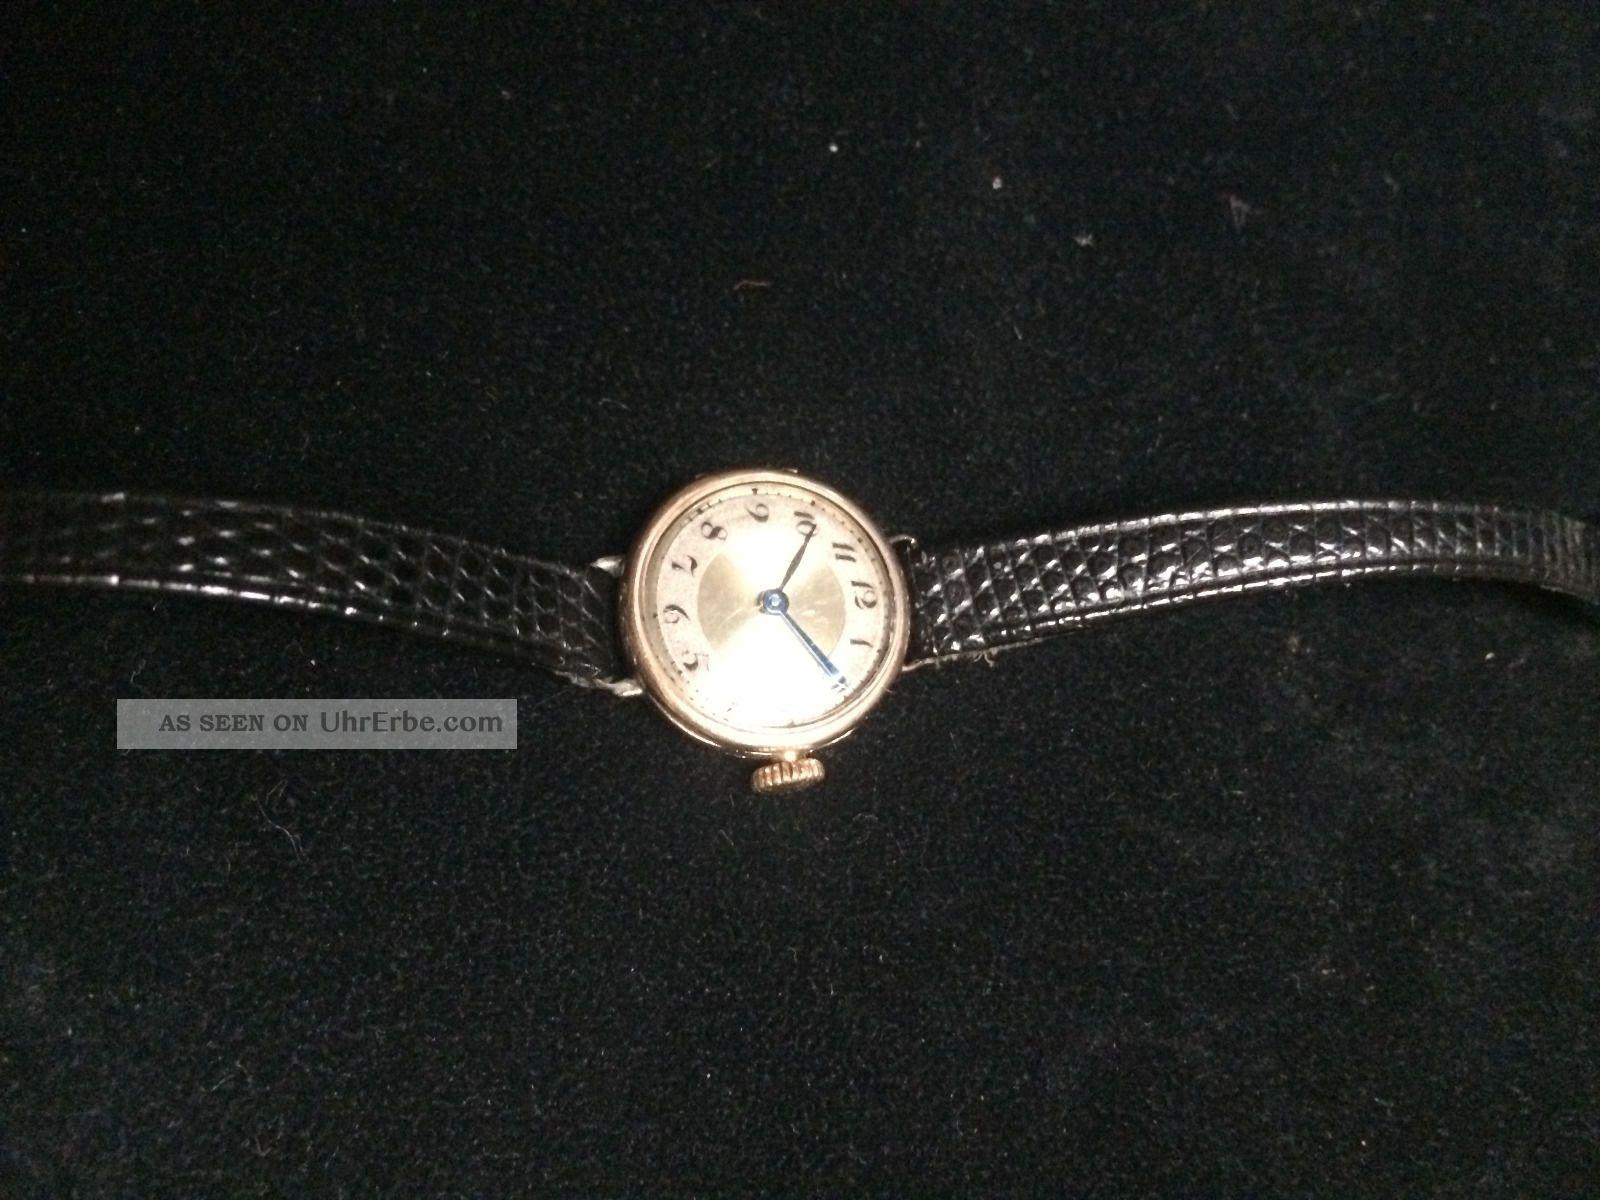 Rolex Damenuhr Gold Alt 0,  375 Armbanduhren Bild